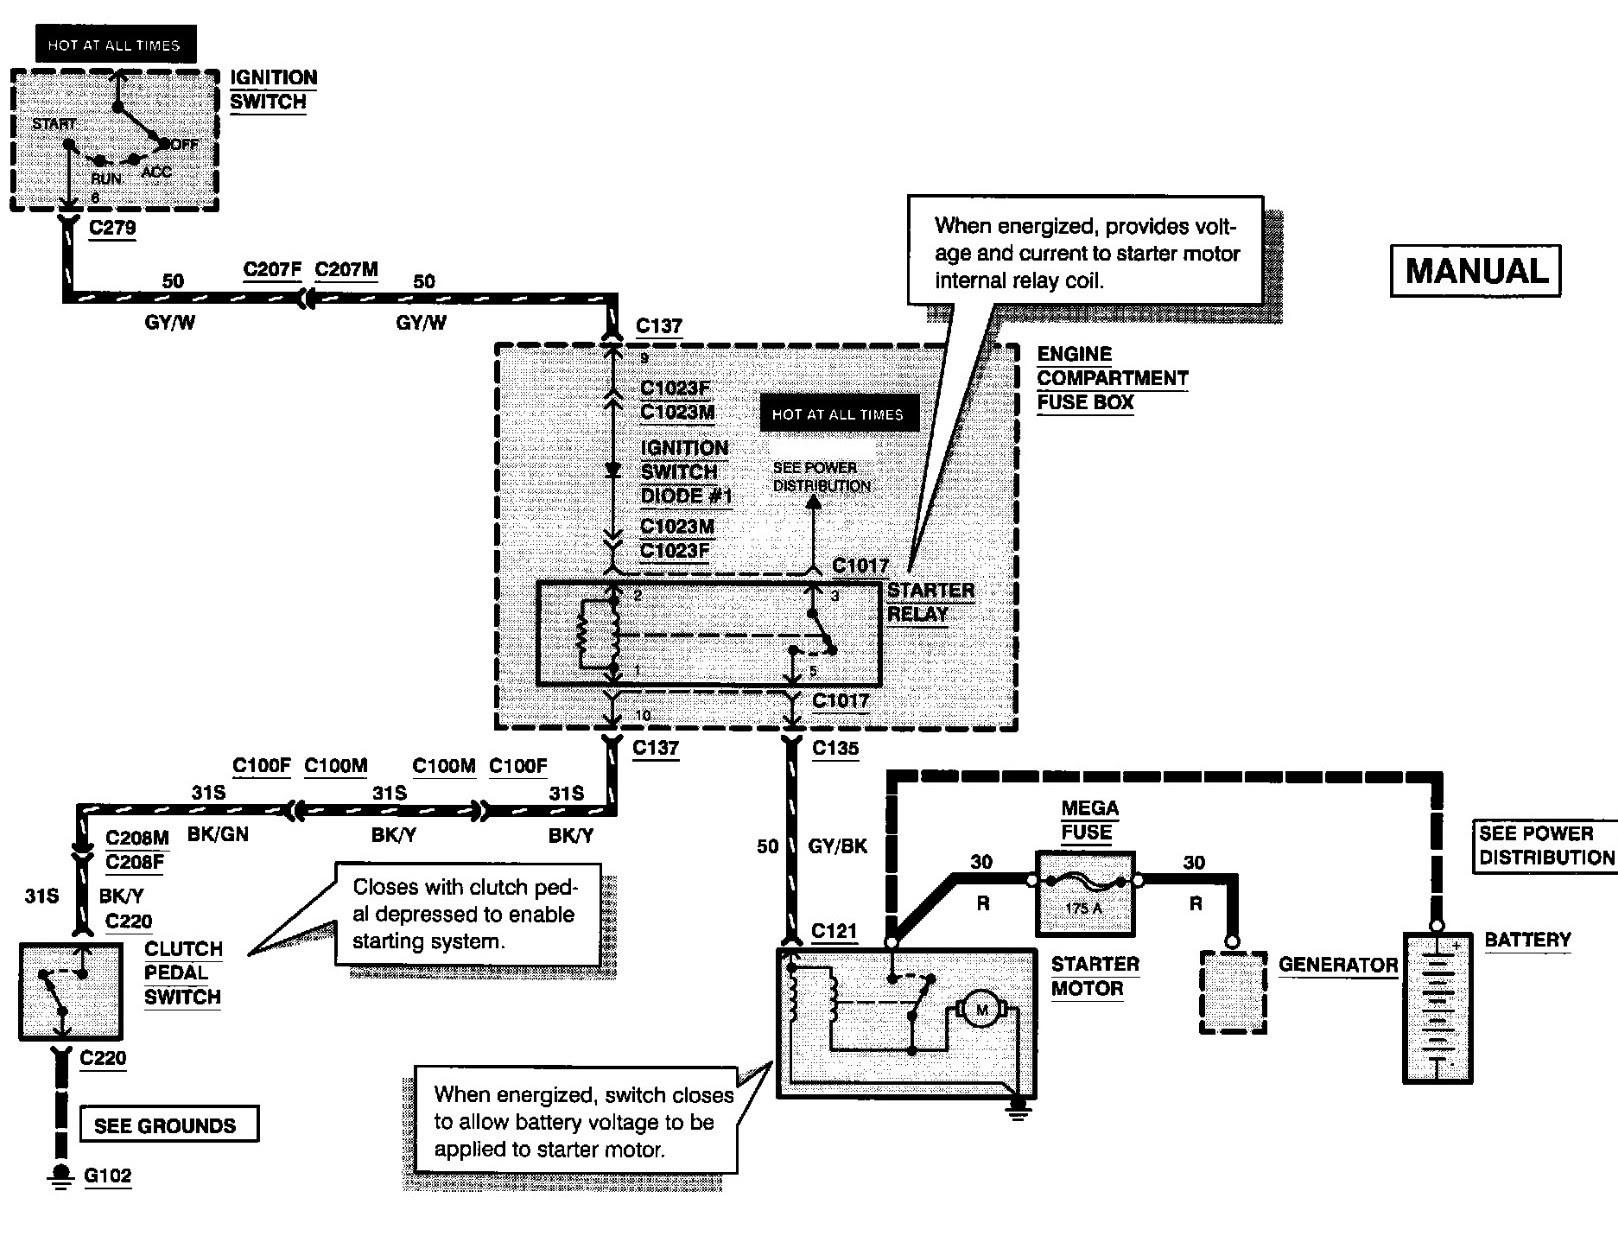 www.automotix.net/autorepair/diy/1998-ford-contour-wiring ...